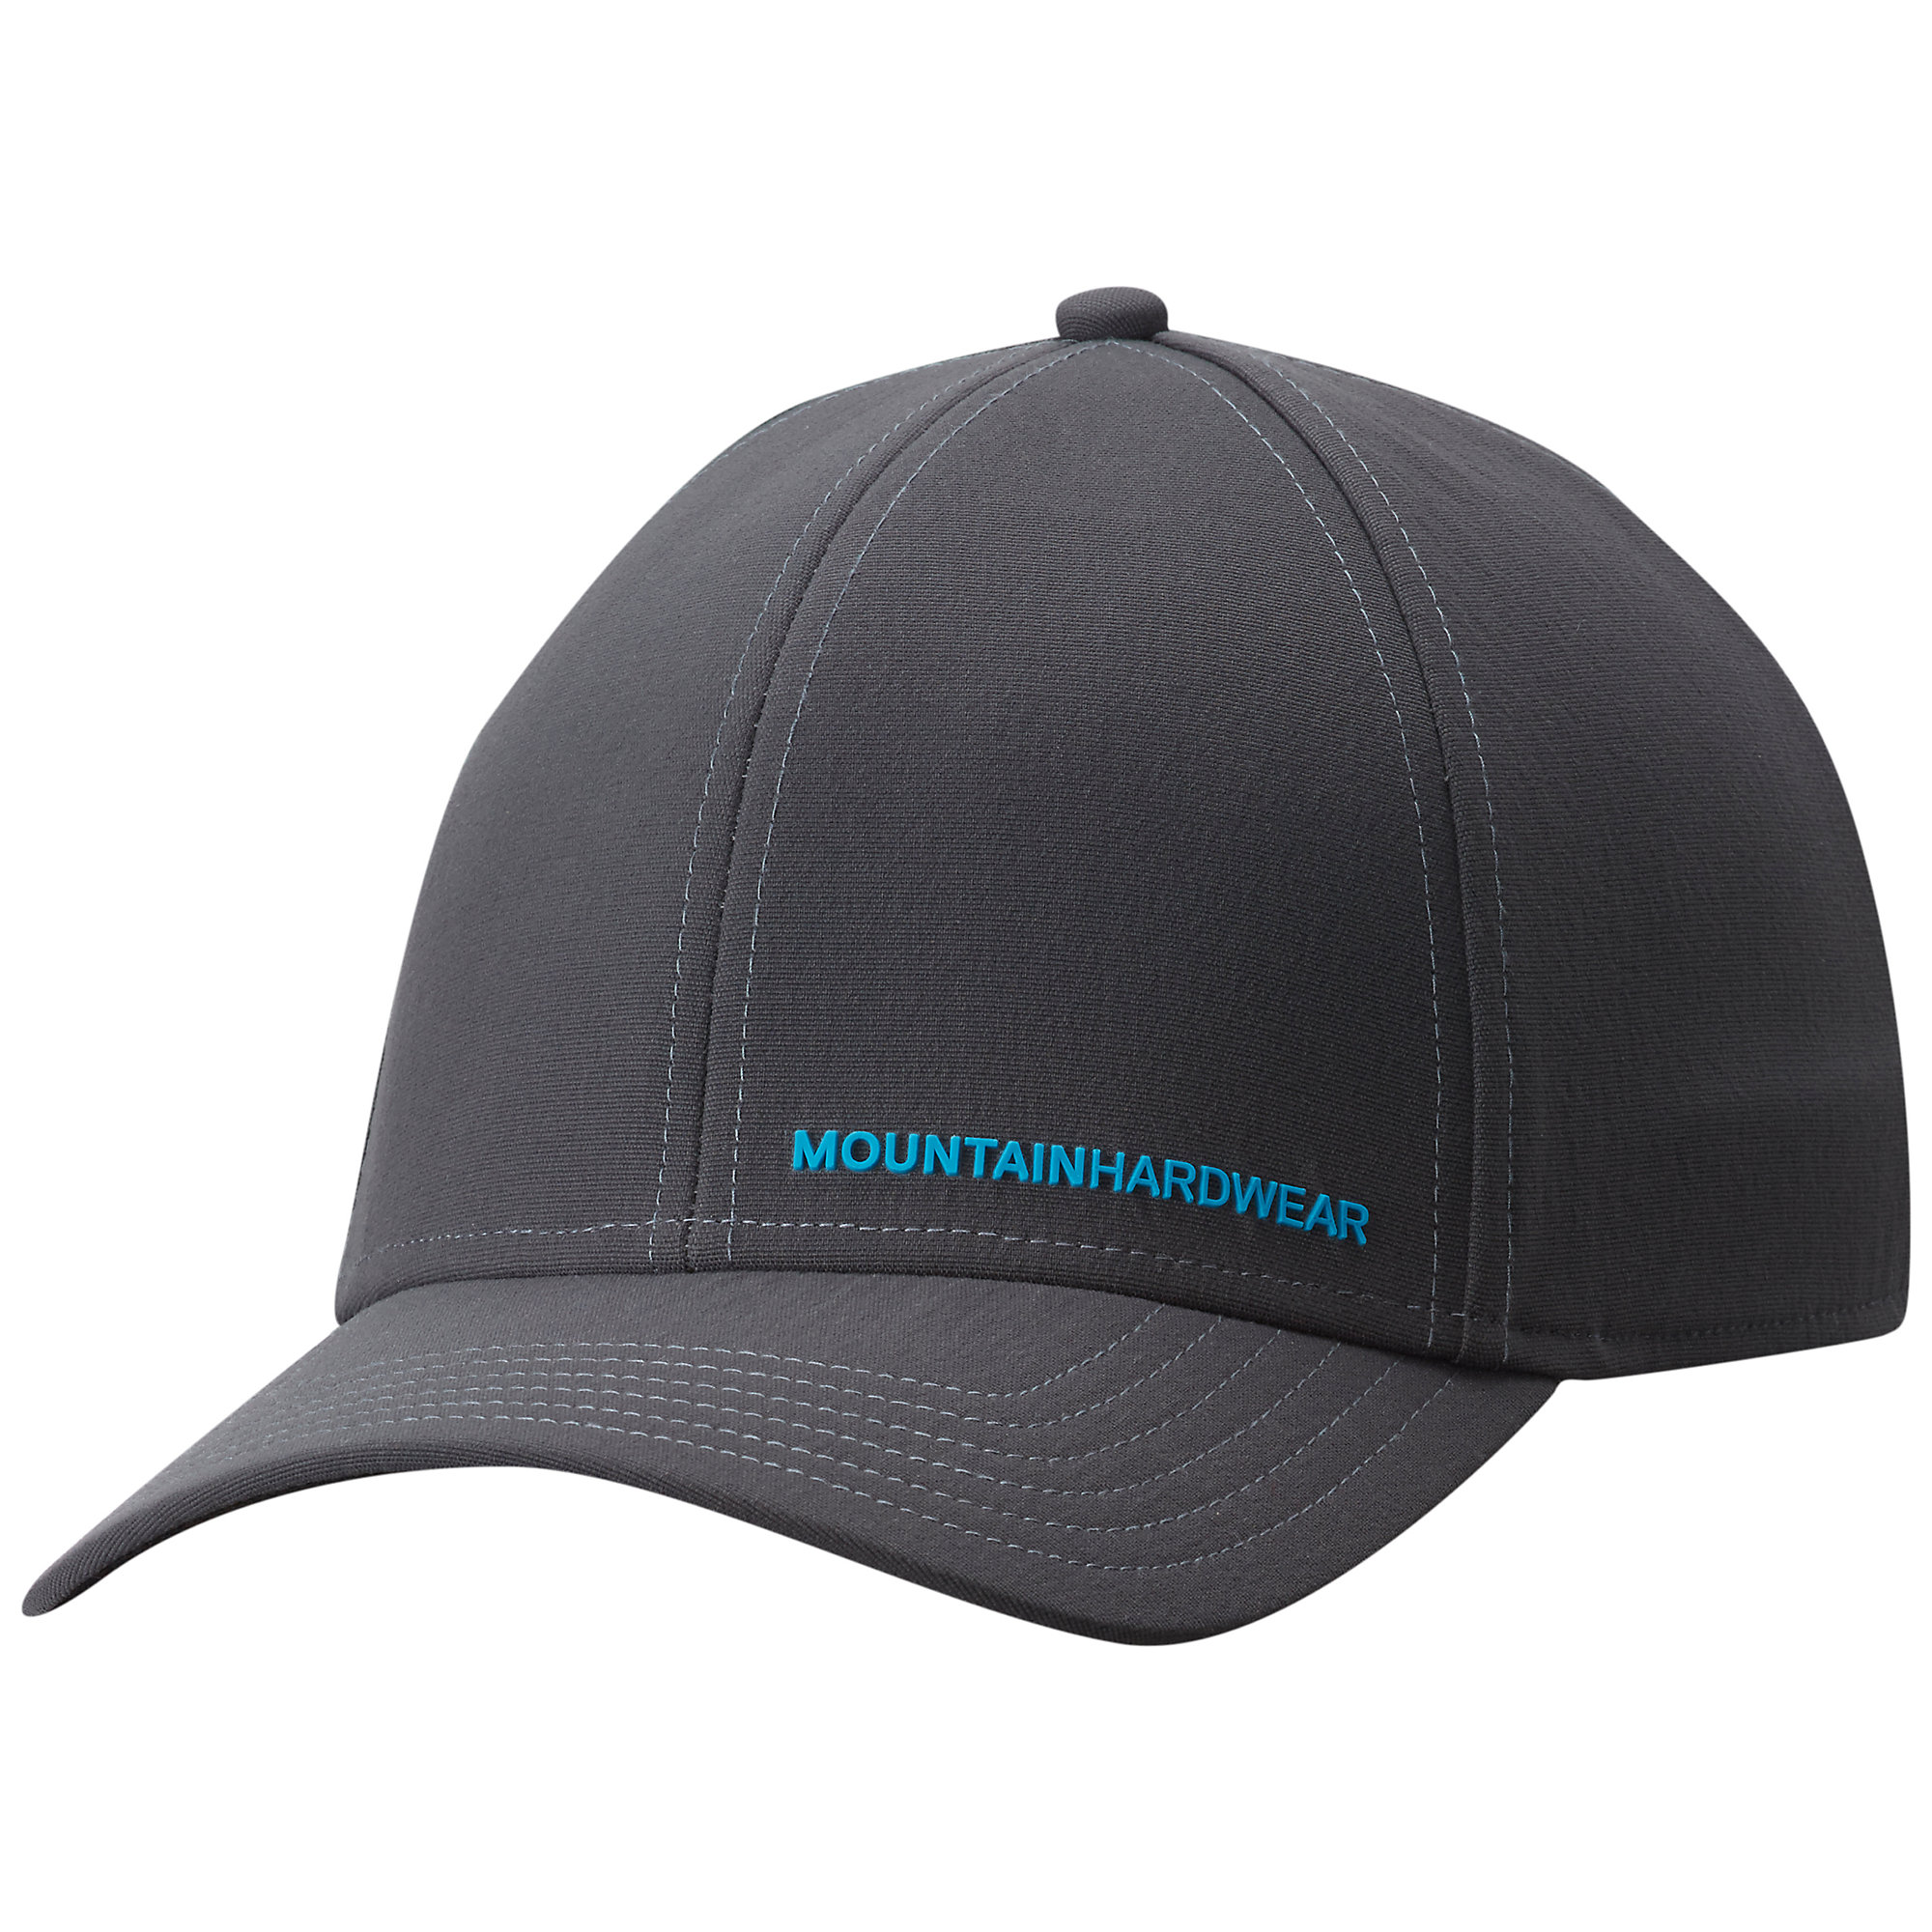 Mountain Hardwear Hardwearing Nylon Baseball Cap